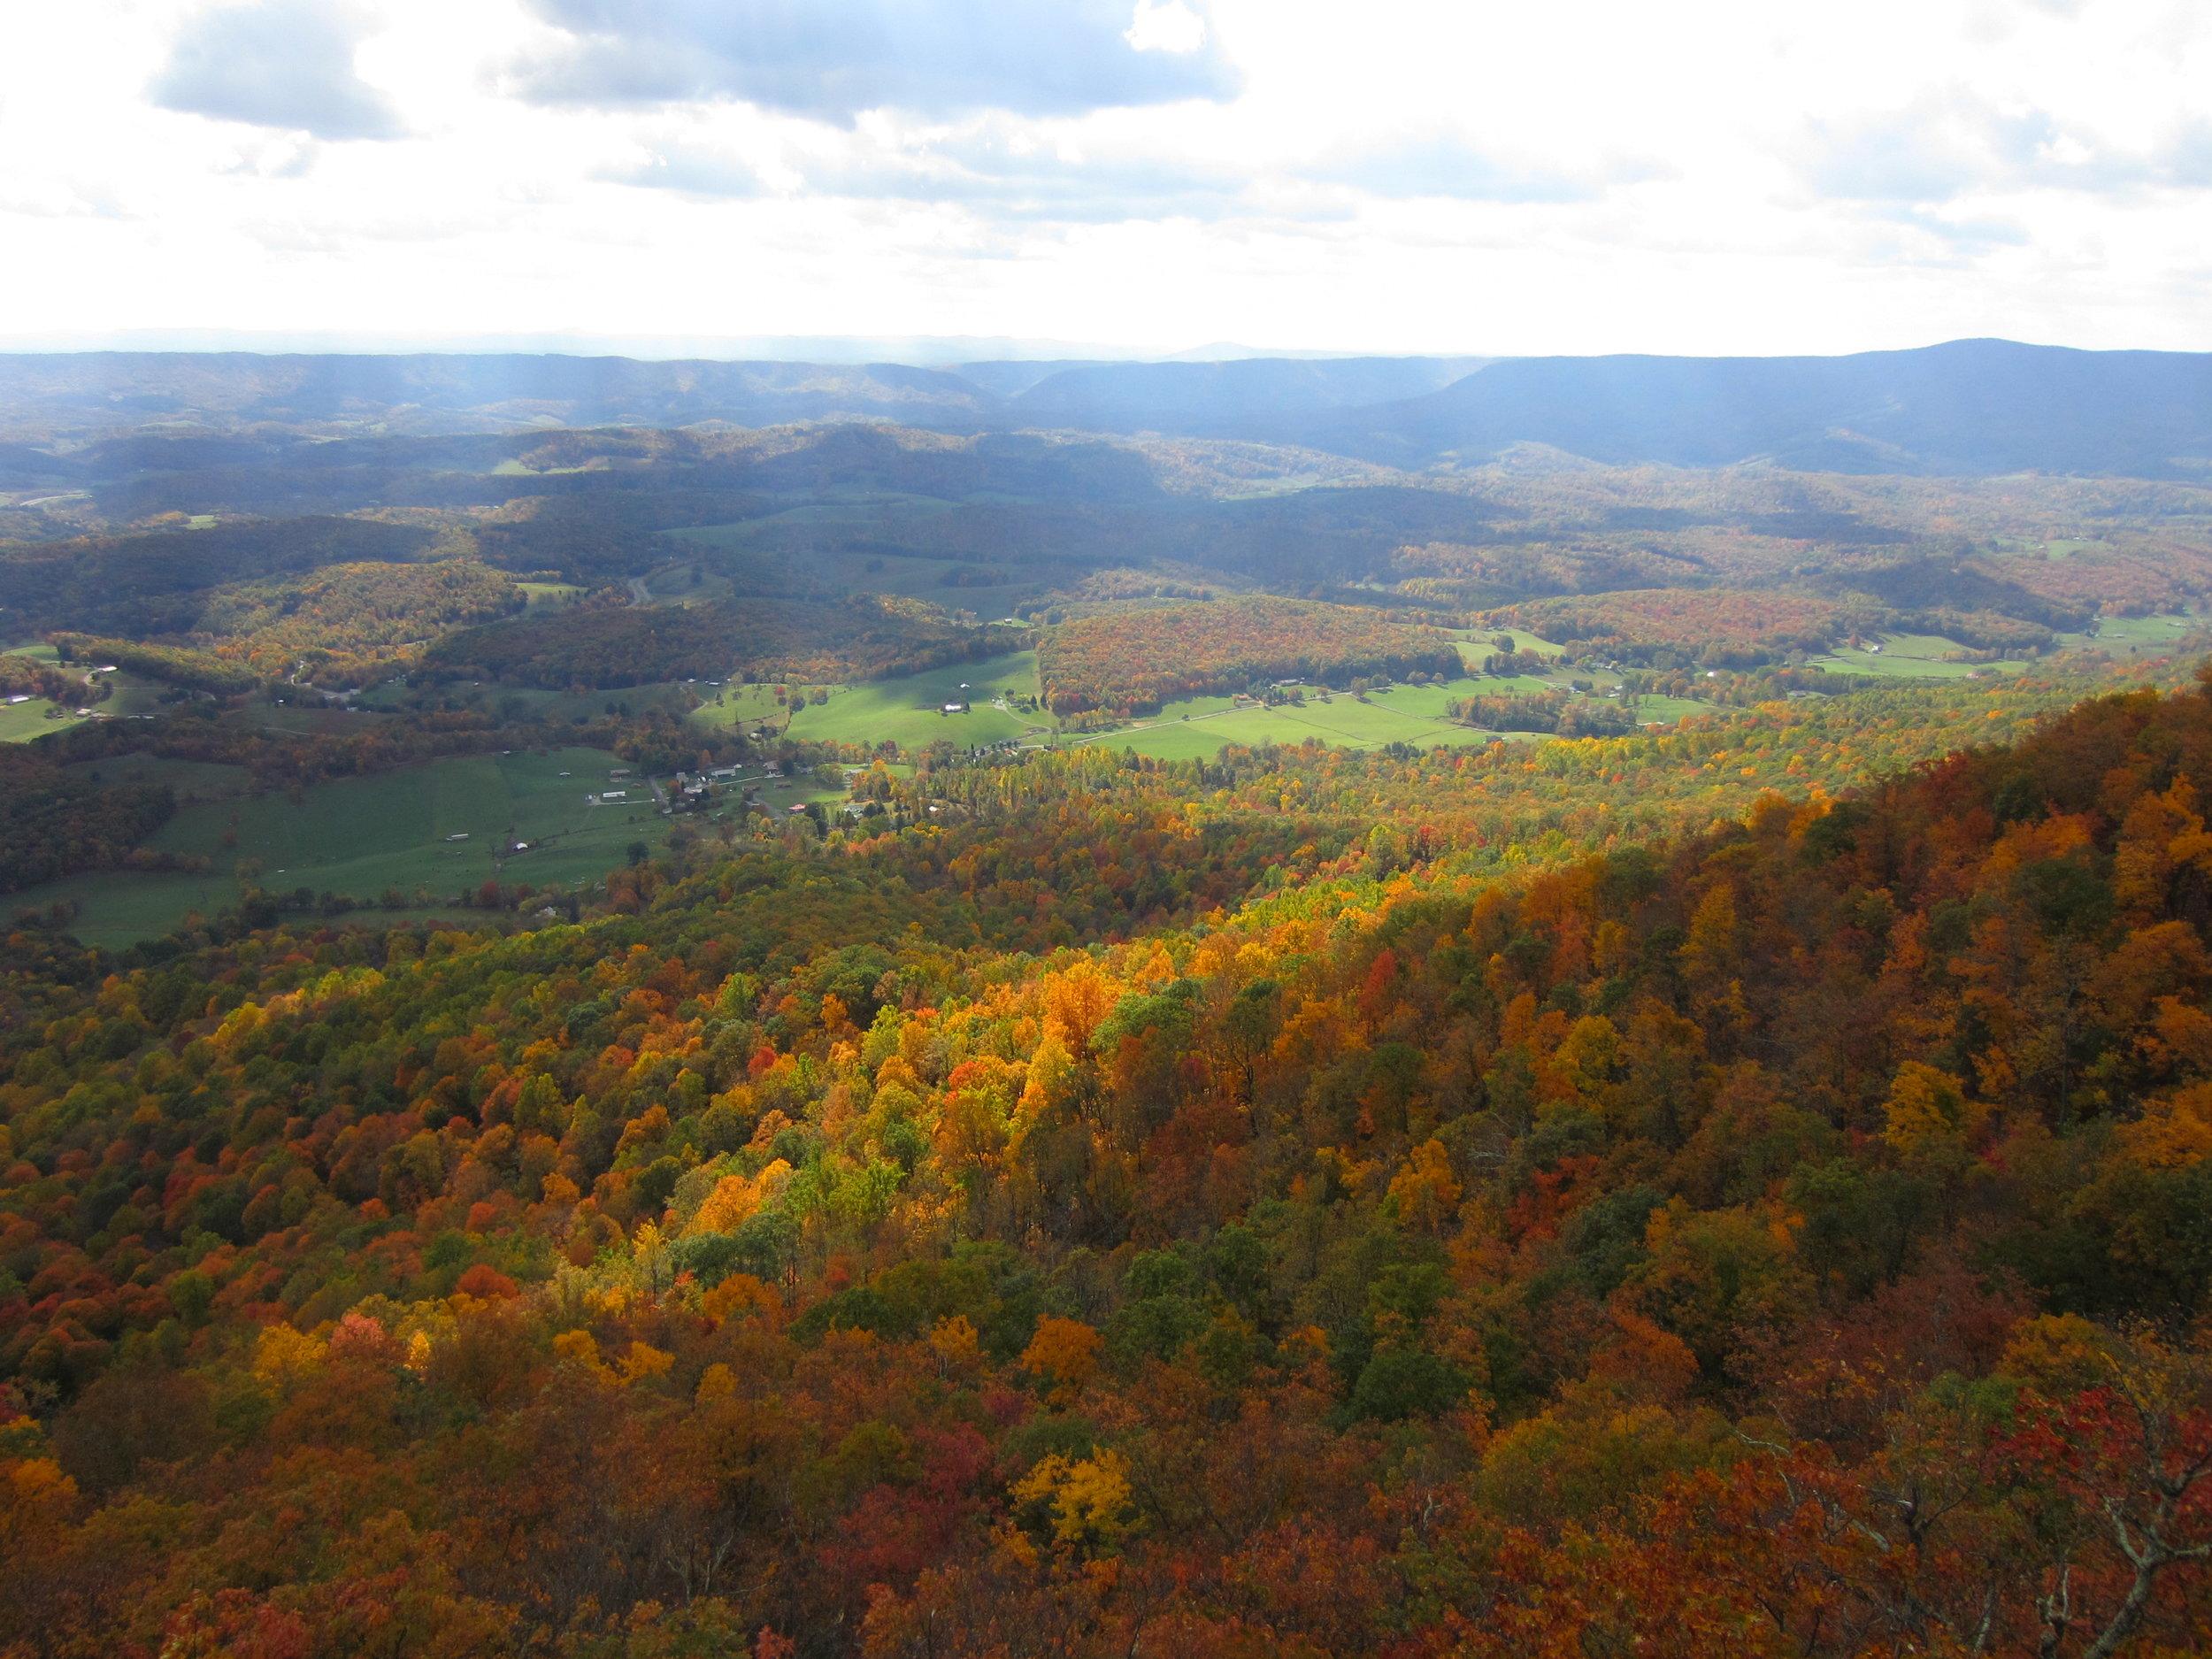 Spectacular fall colors in Virginia (near Blacksburg).